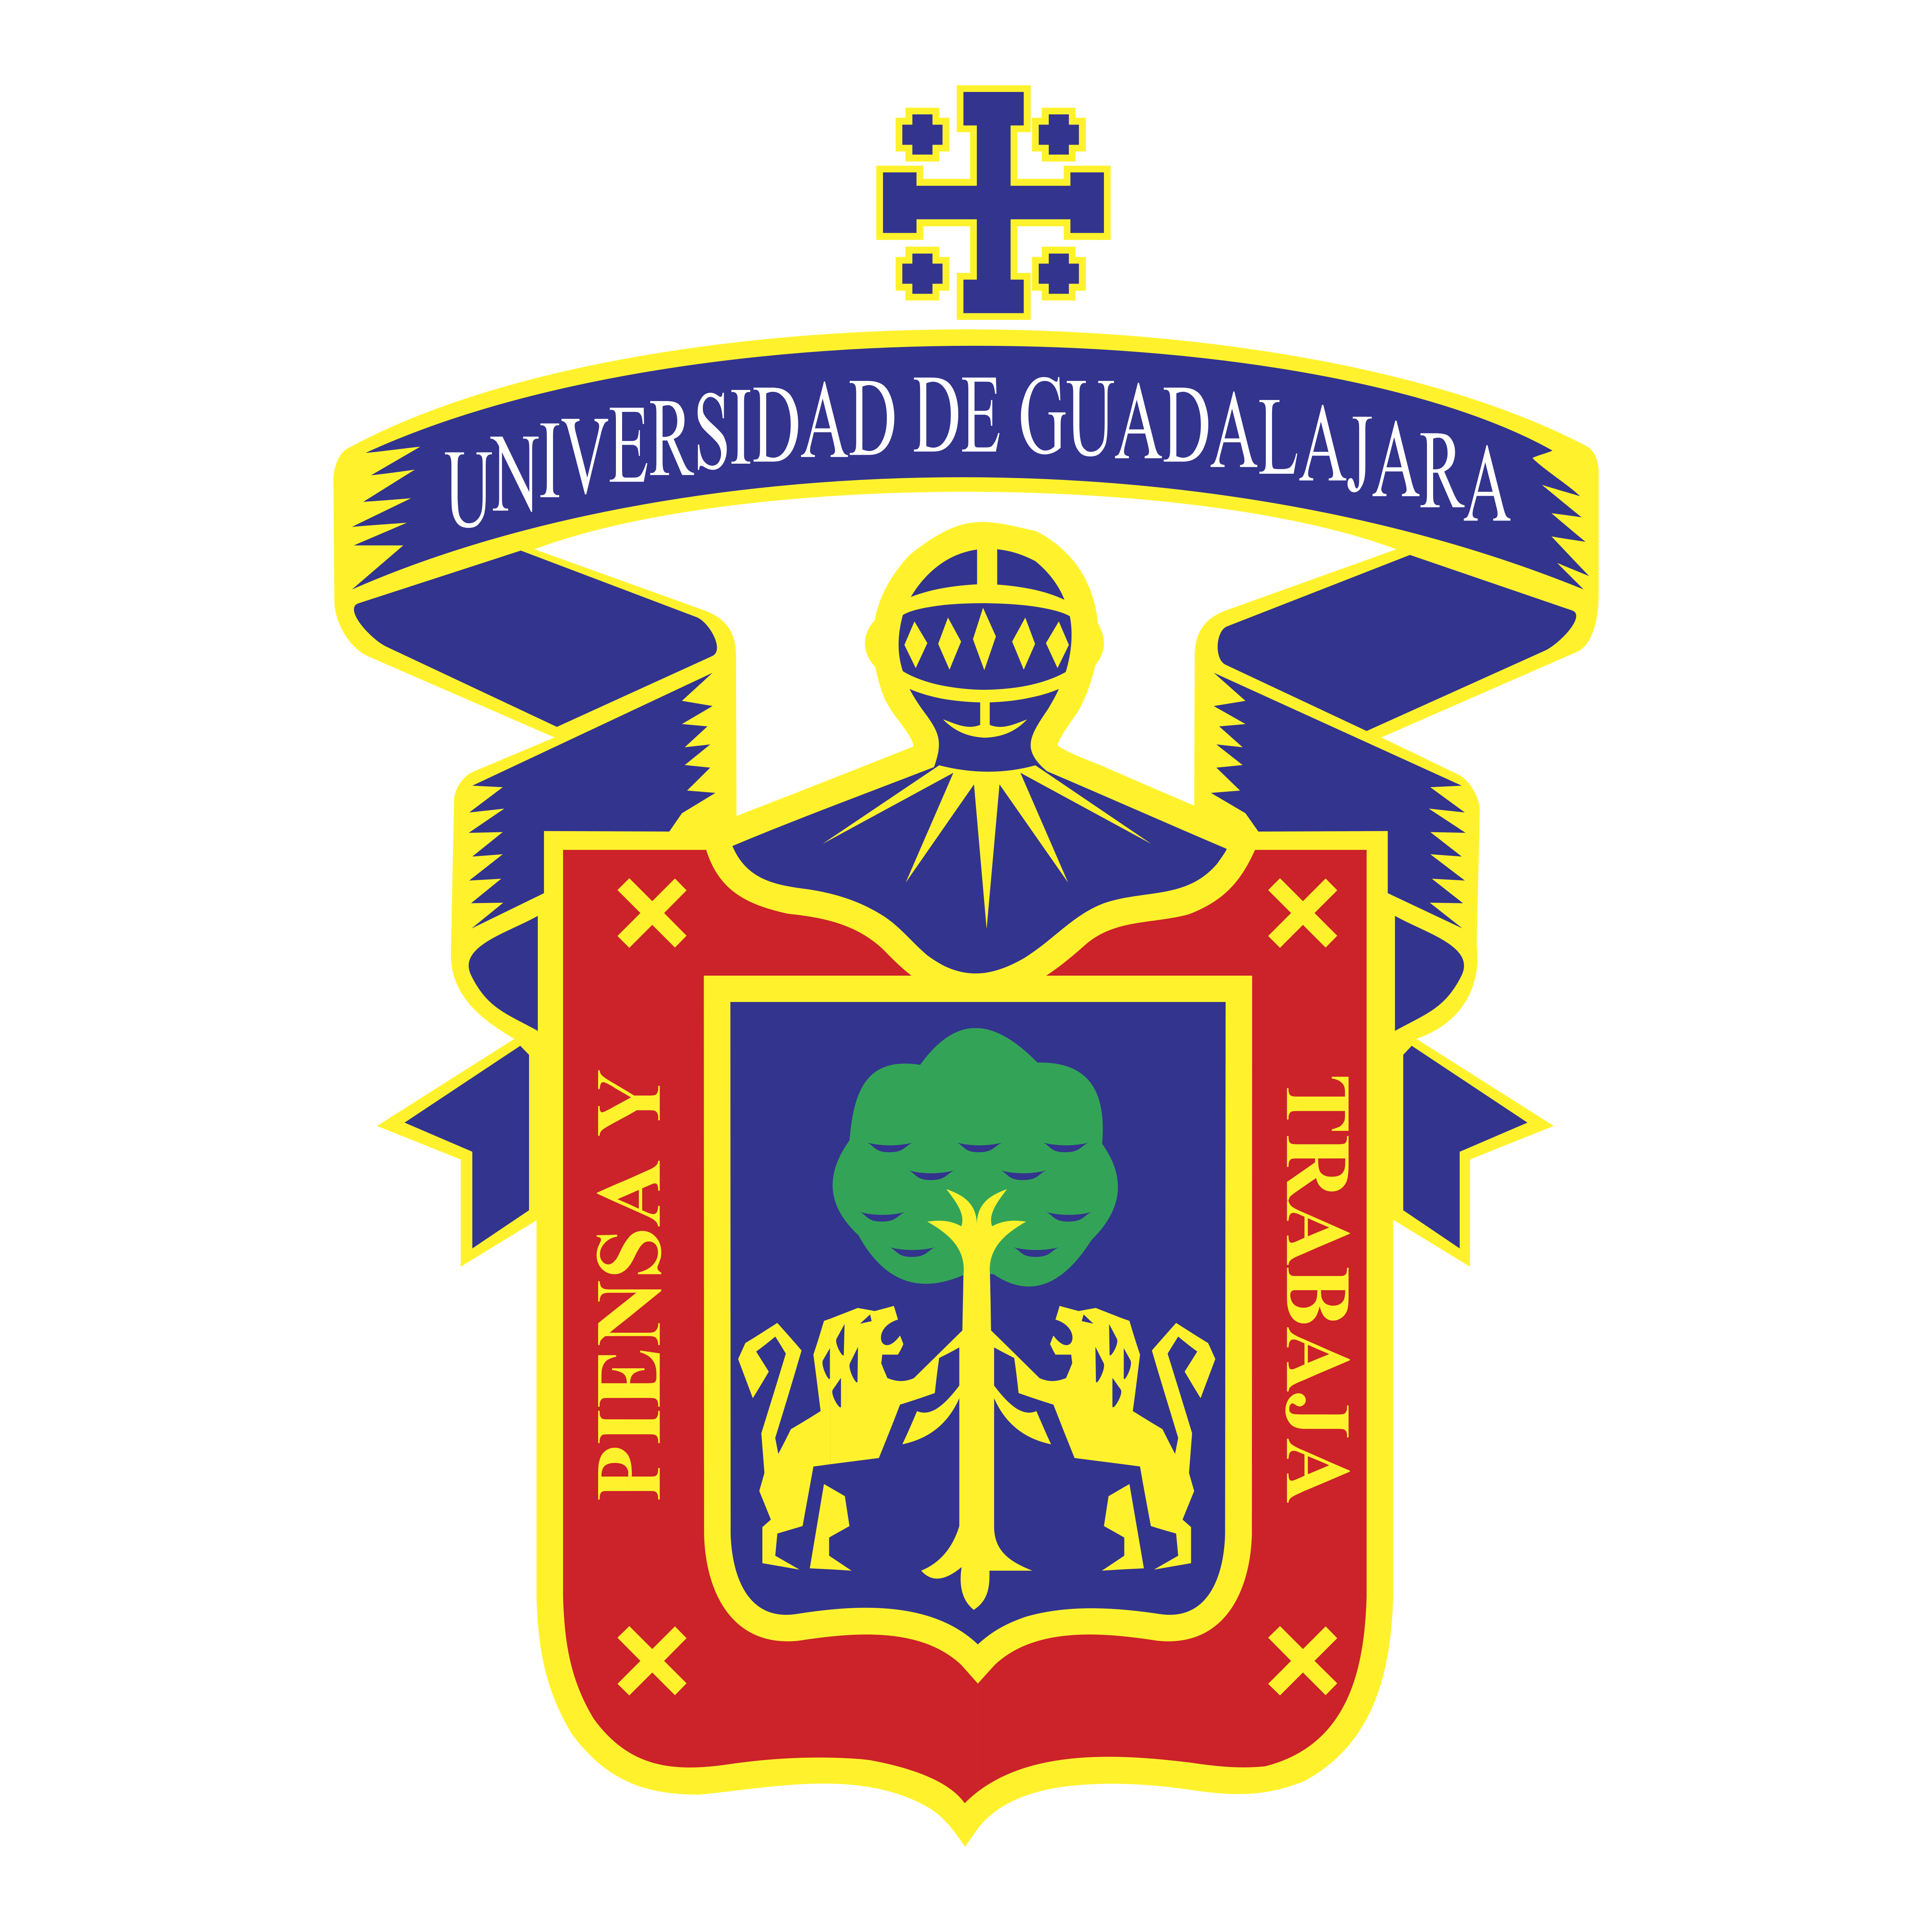 Guadalajara University